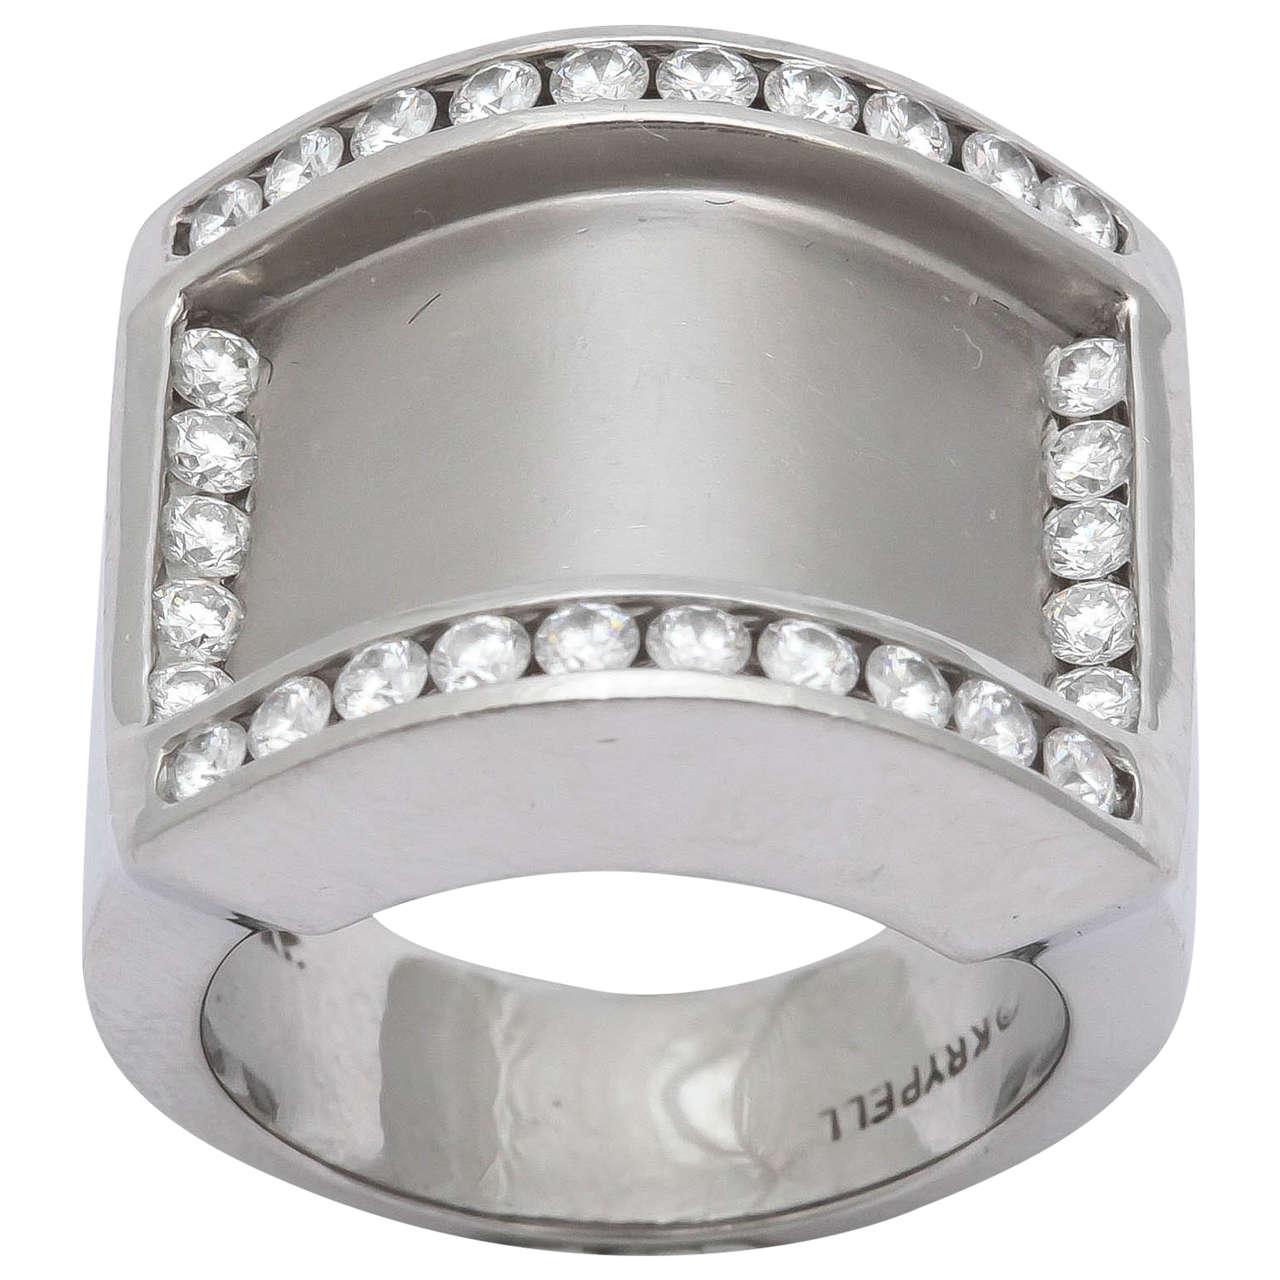 Charles Krypell Diamond Platinum Band Ring